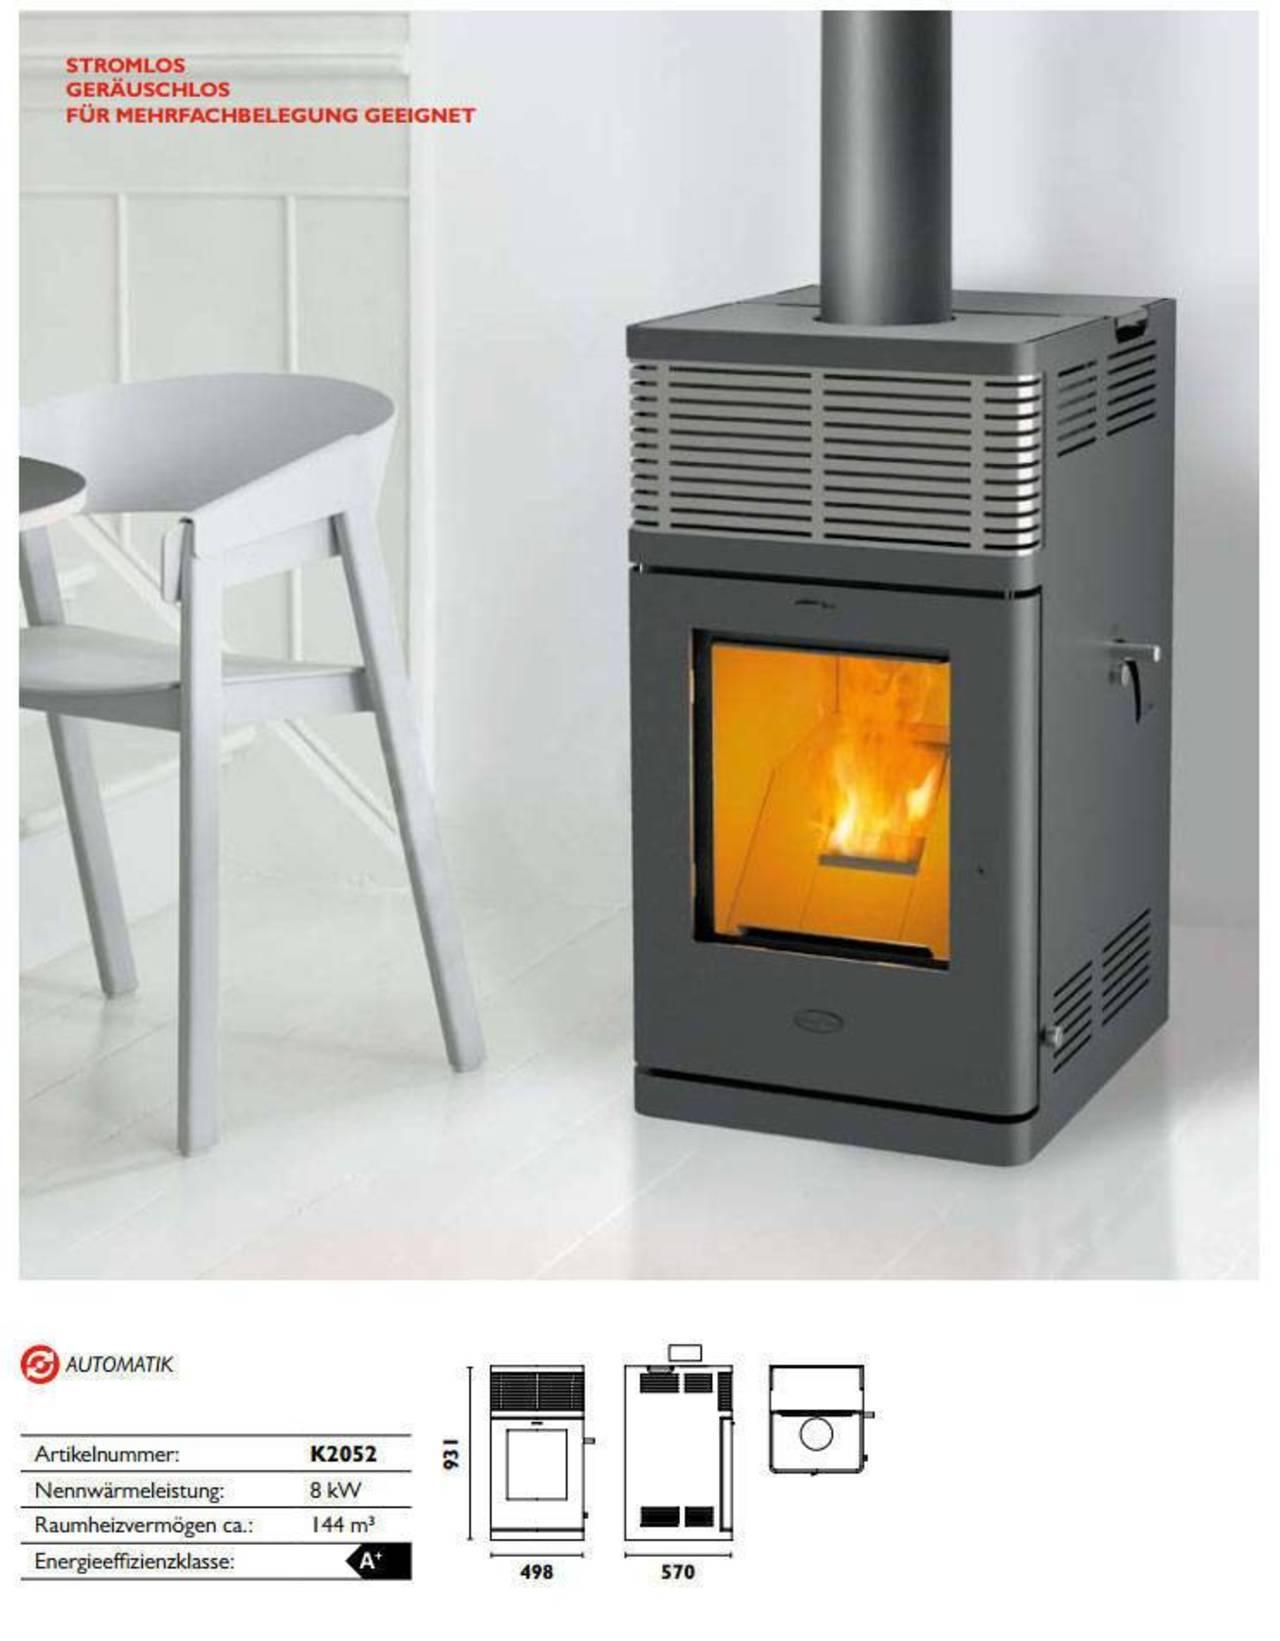 fireplace pelletofen gravio 8 kw strom u ger uschlos ofen kamin pellet ebay. Black Bedroom Furniture Sets. Home Design Ideas